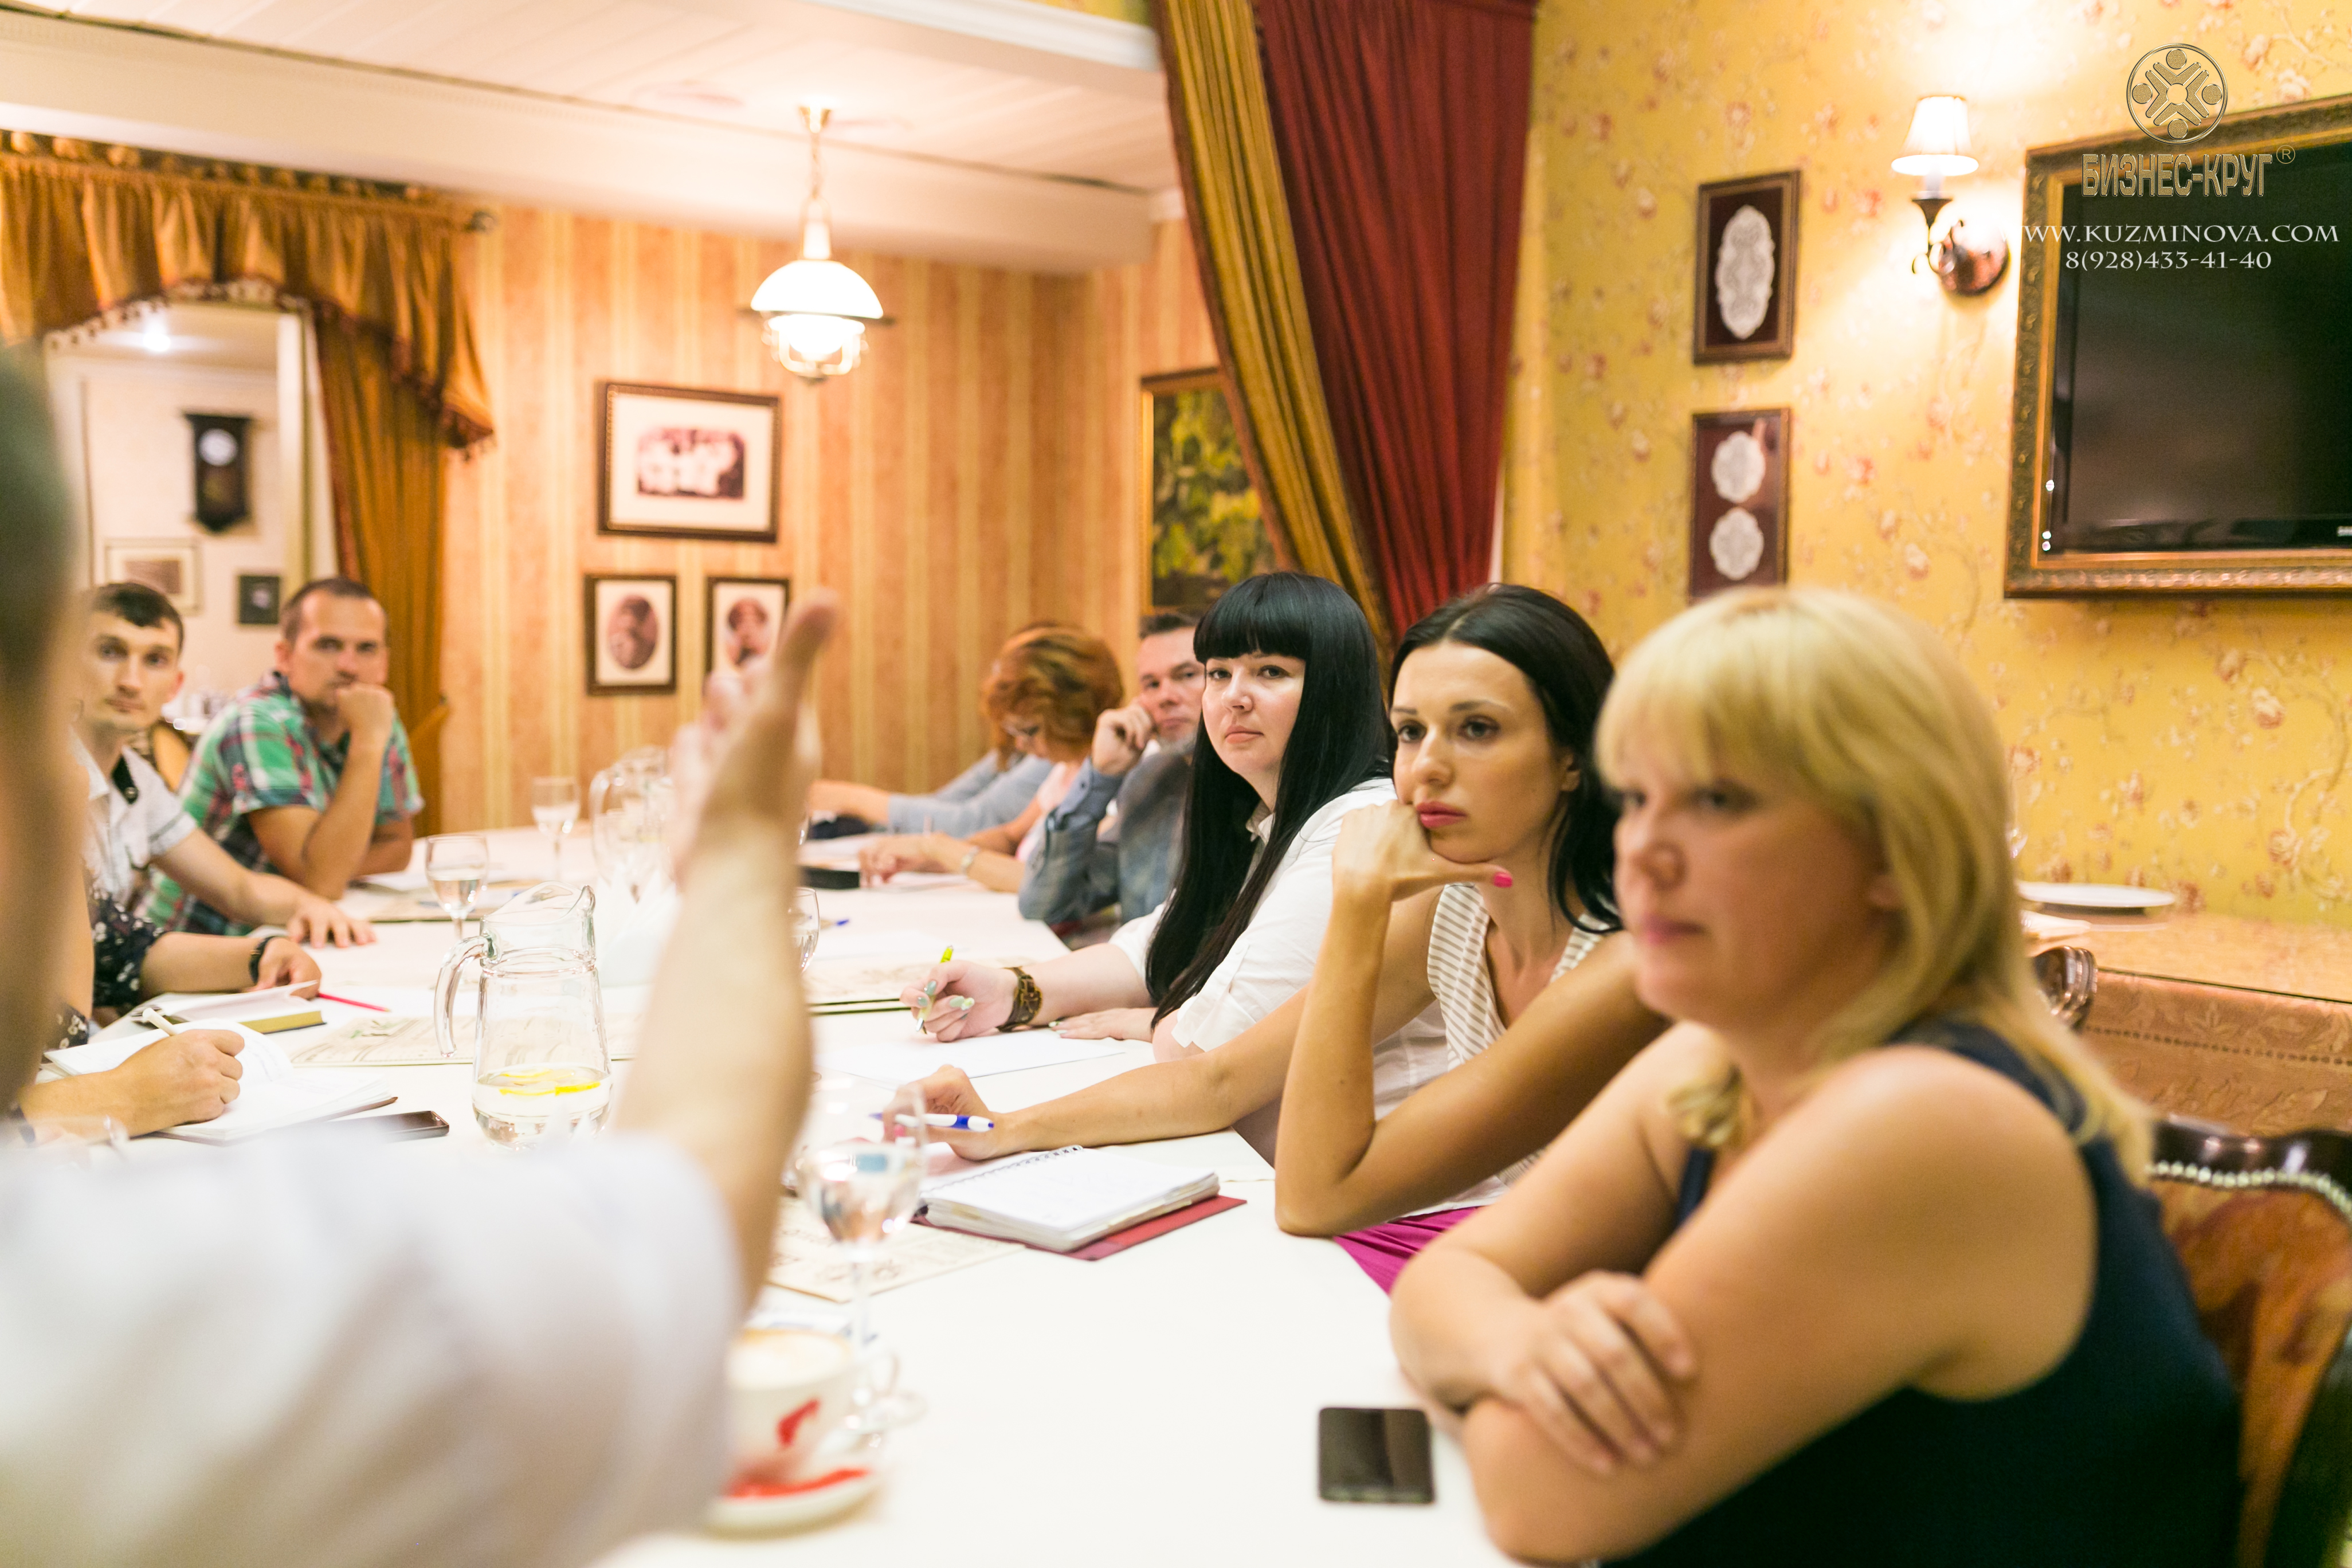 МК Бориса Аветисяна в Бизнес-кругу (9)